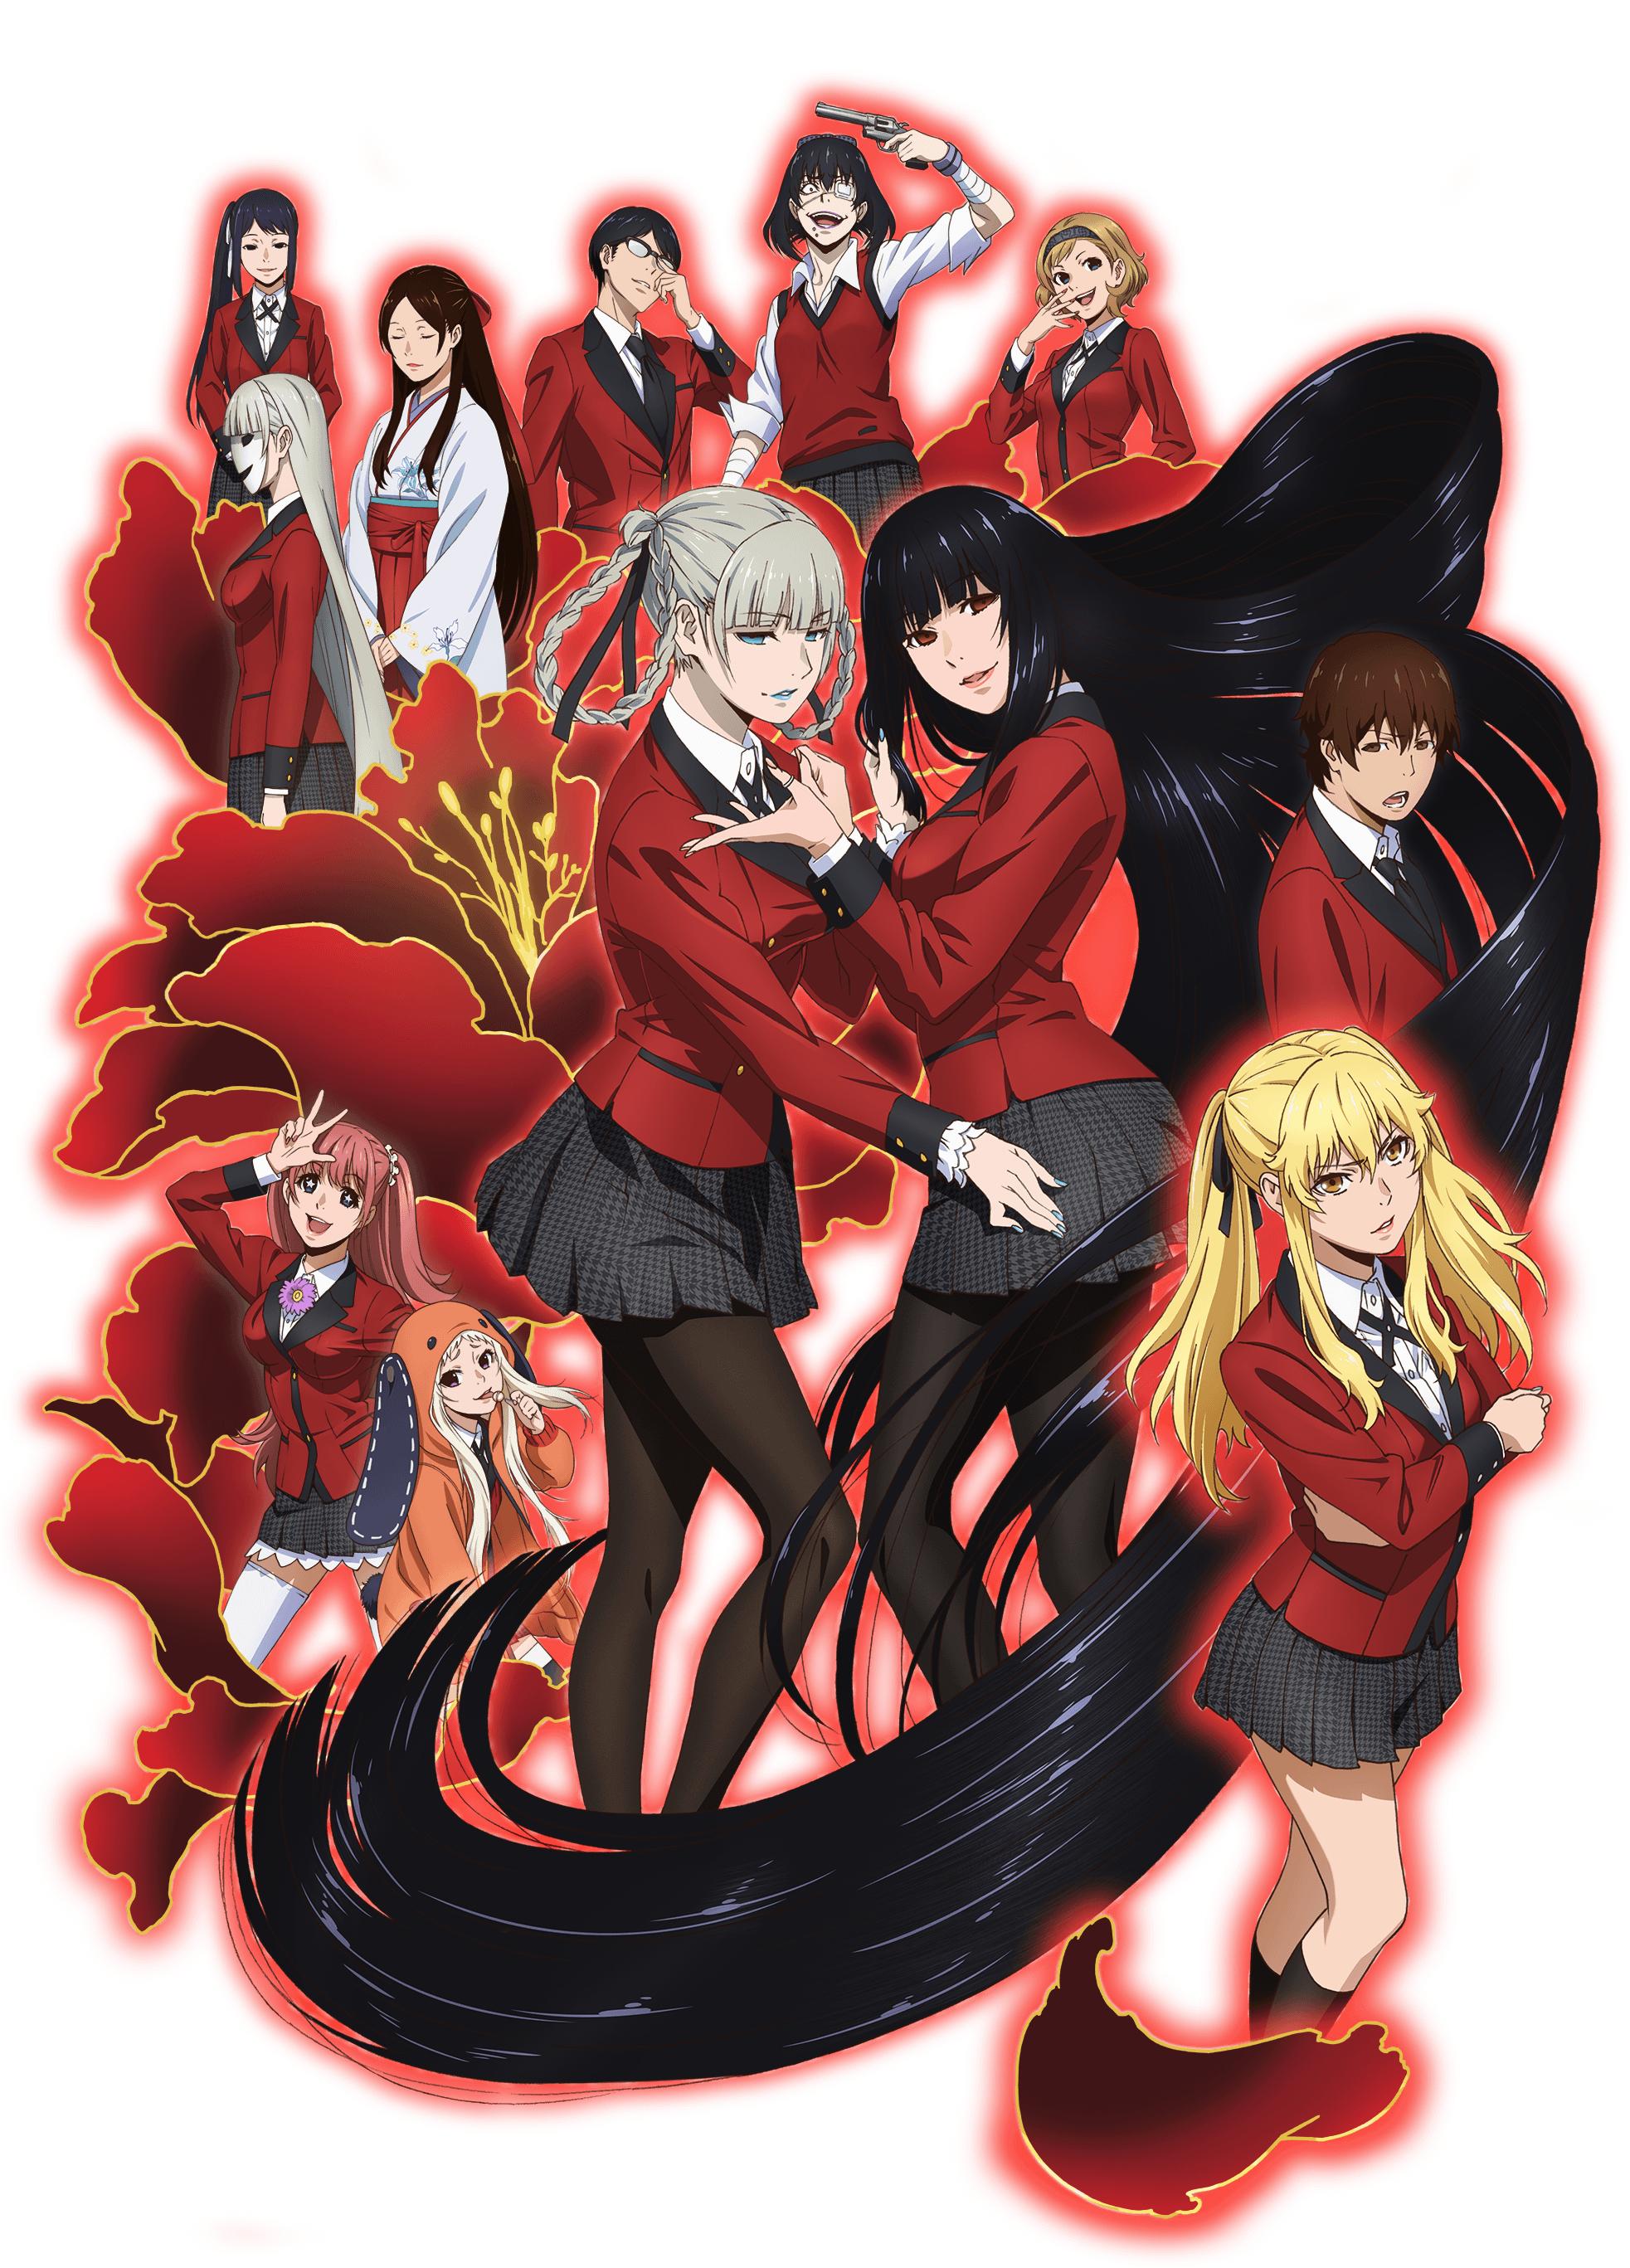 Kakegurui Mobile Wallpaper 2106234 Zerochan Anime Image Board